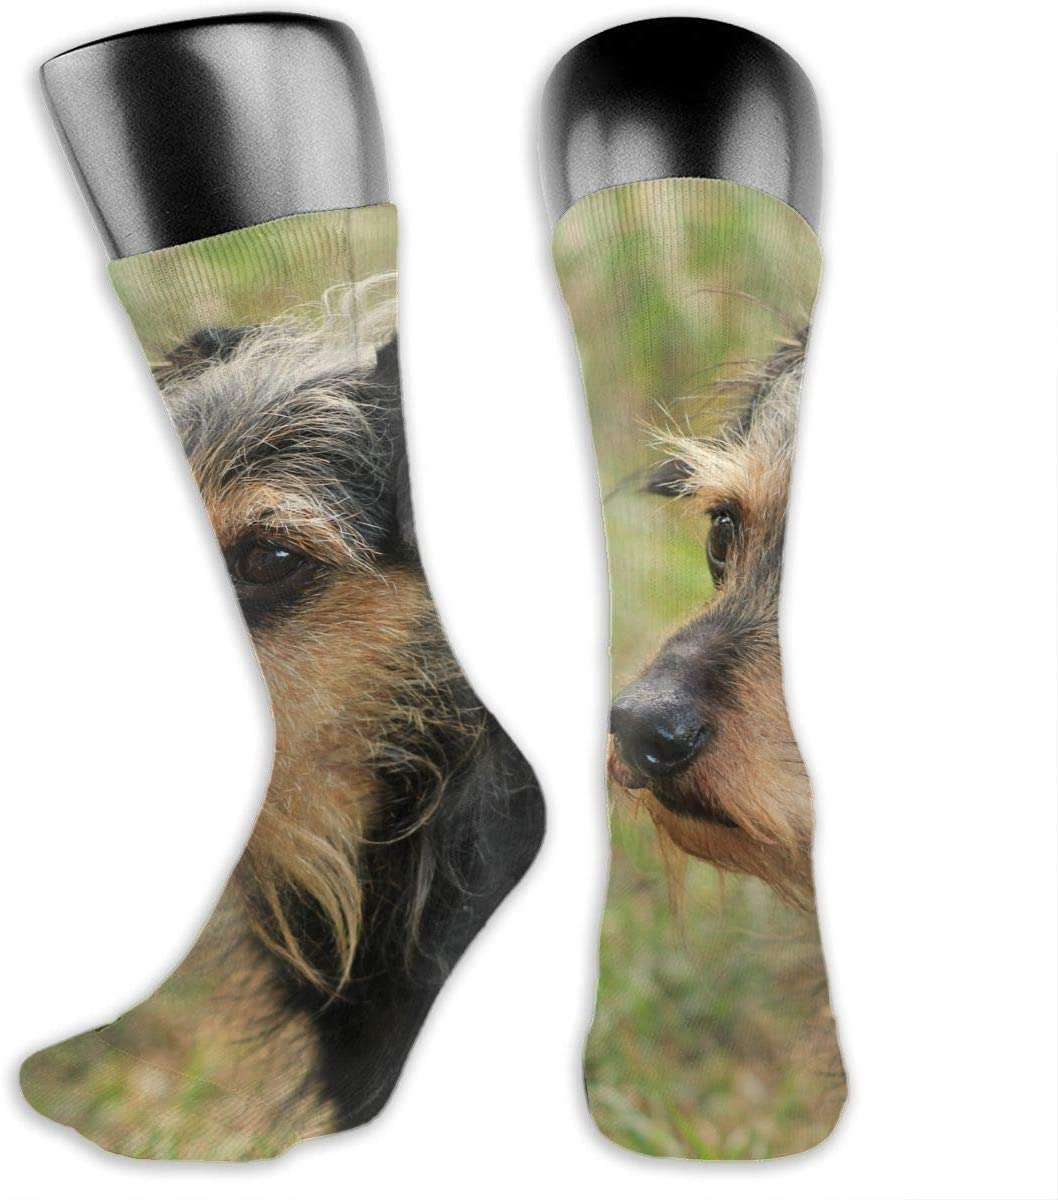 OLGCZM Dachshund Puppy Men Womens Thin High Ankle Casual Socks Fit Outdoor Hiking Trail